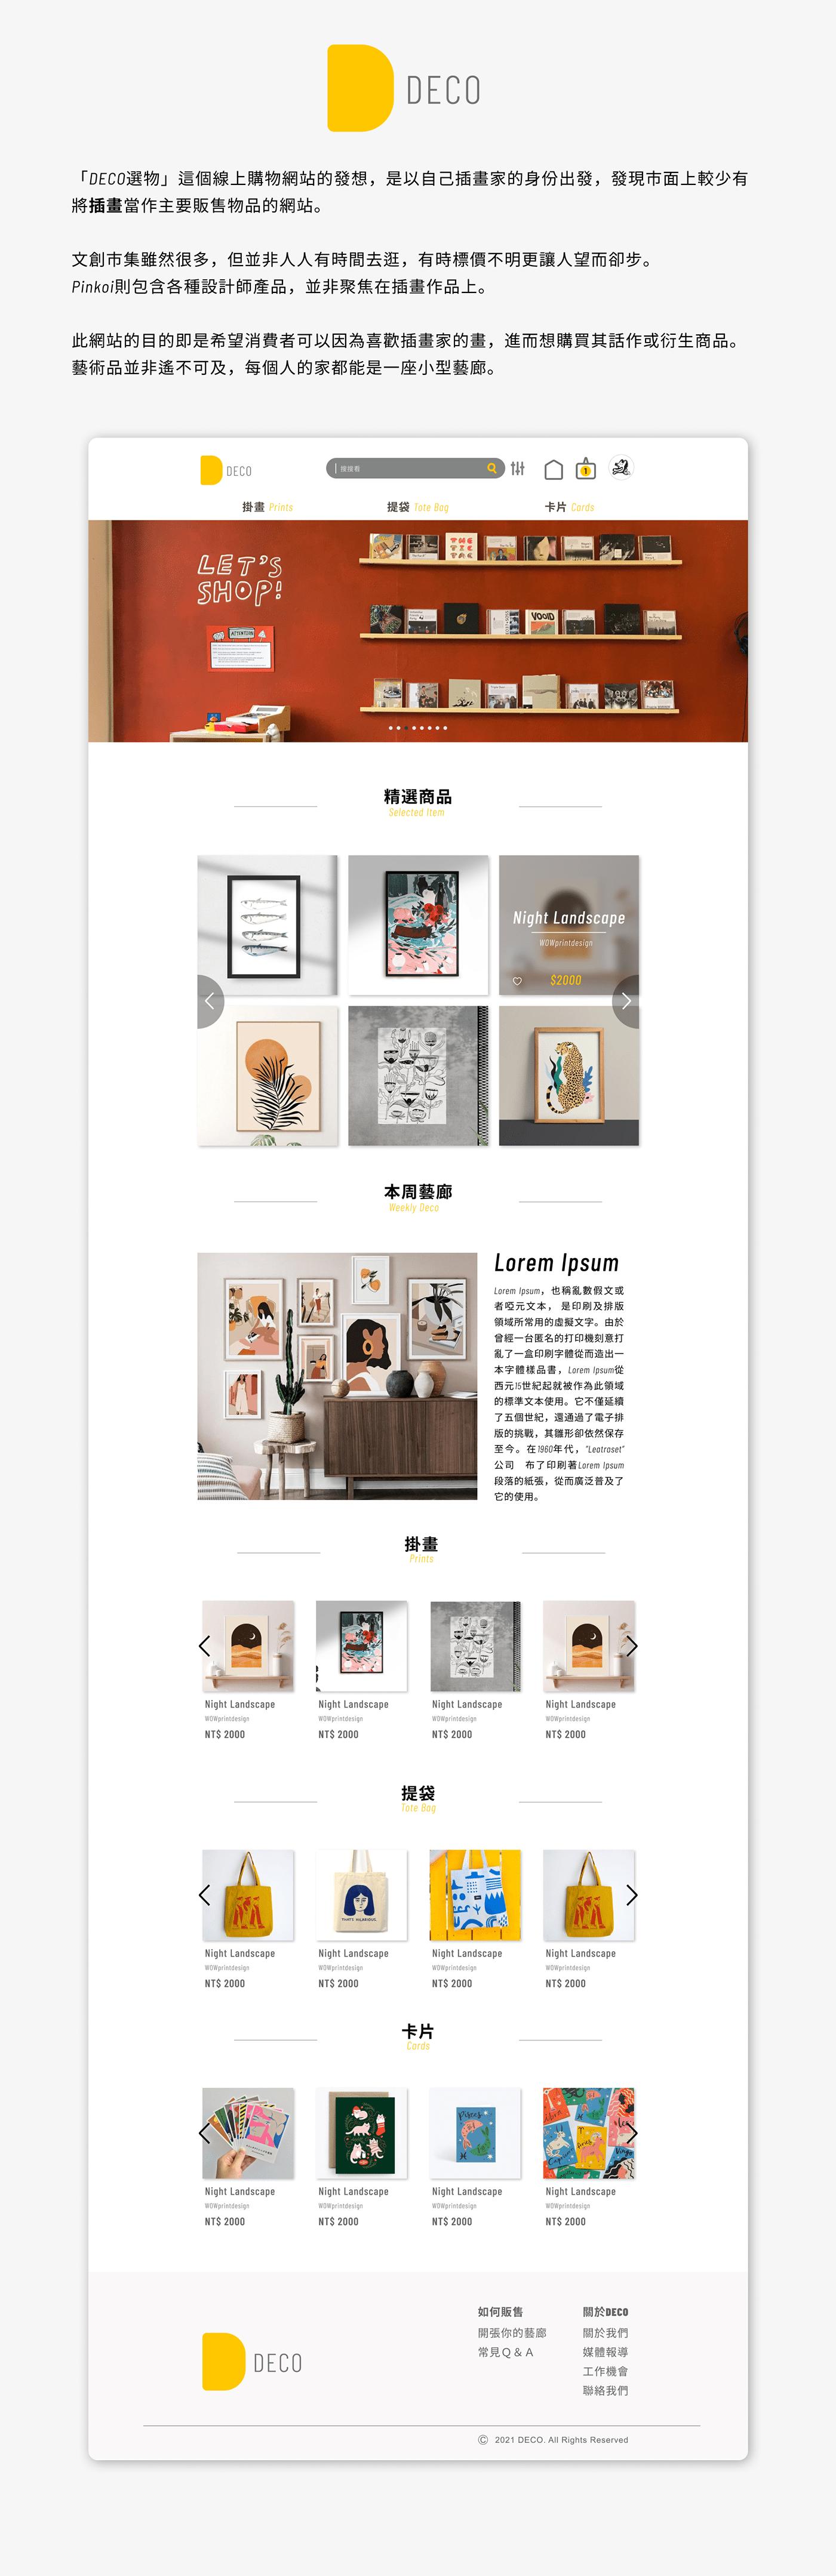 ecommerce website one page website online store website ui design uiux user interface Website Design